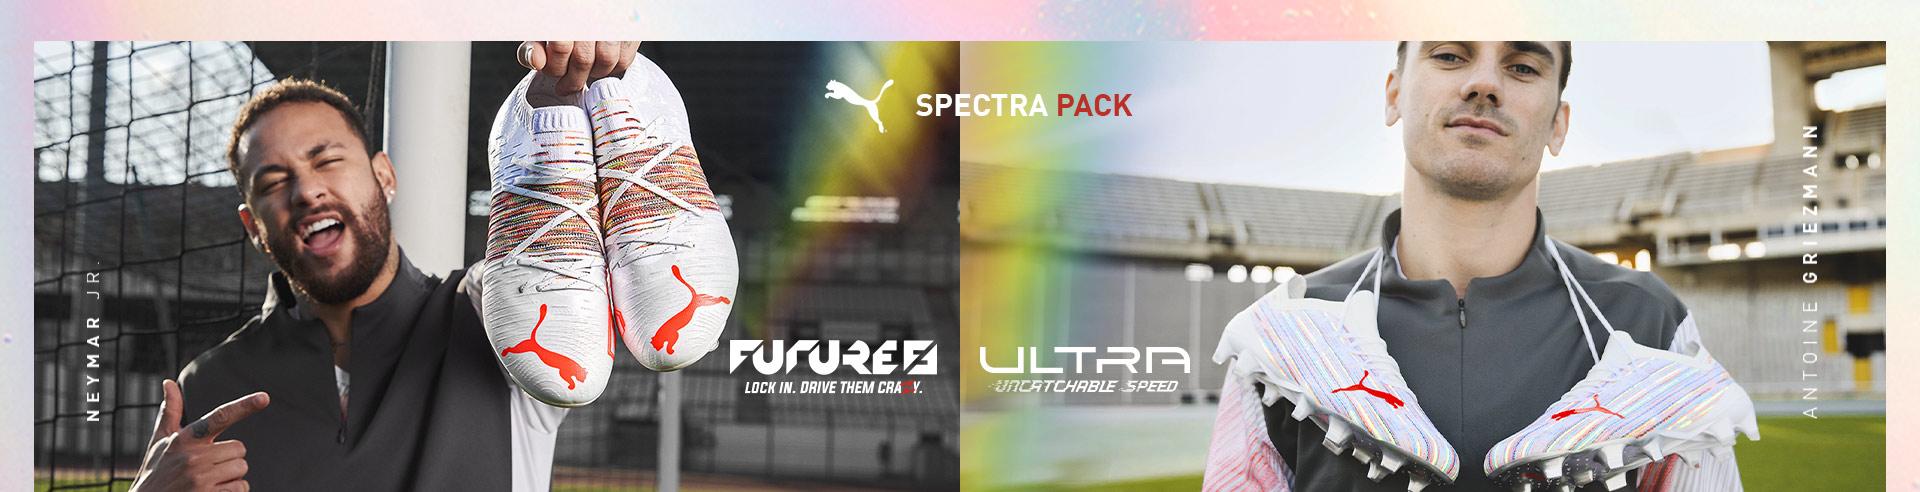 PUMA SPECTRA PACK ABRIL 2021